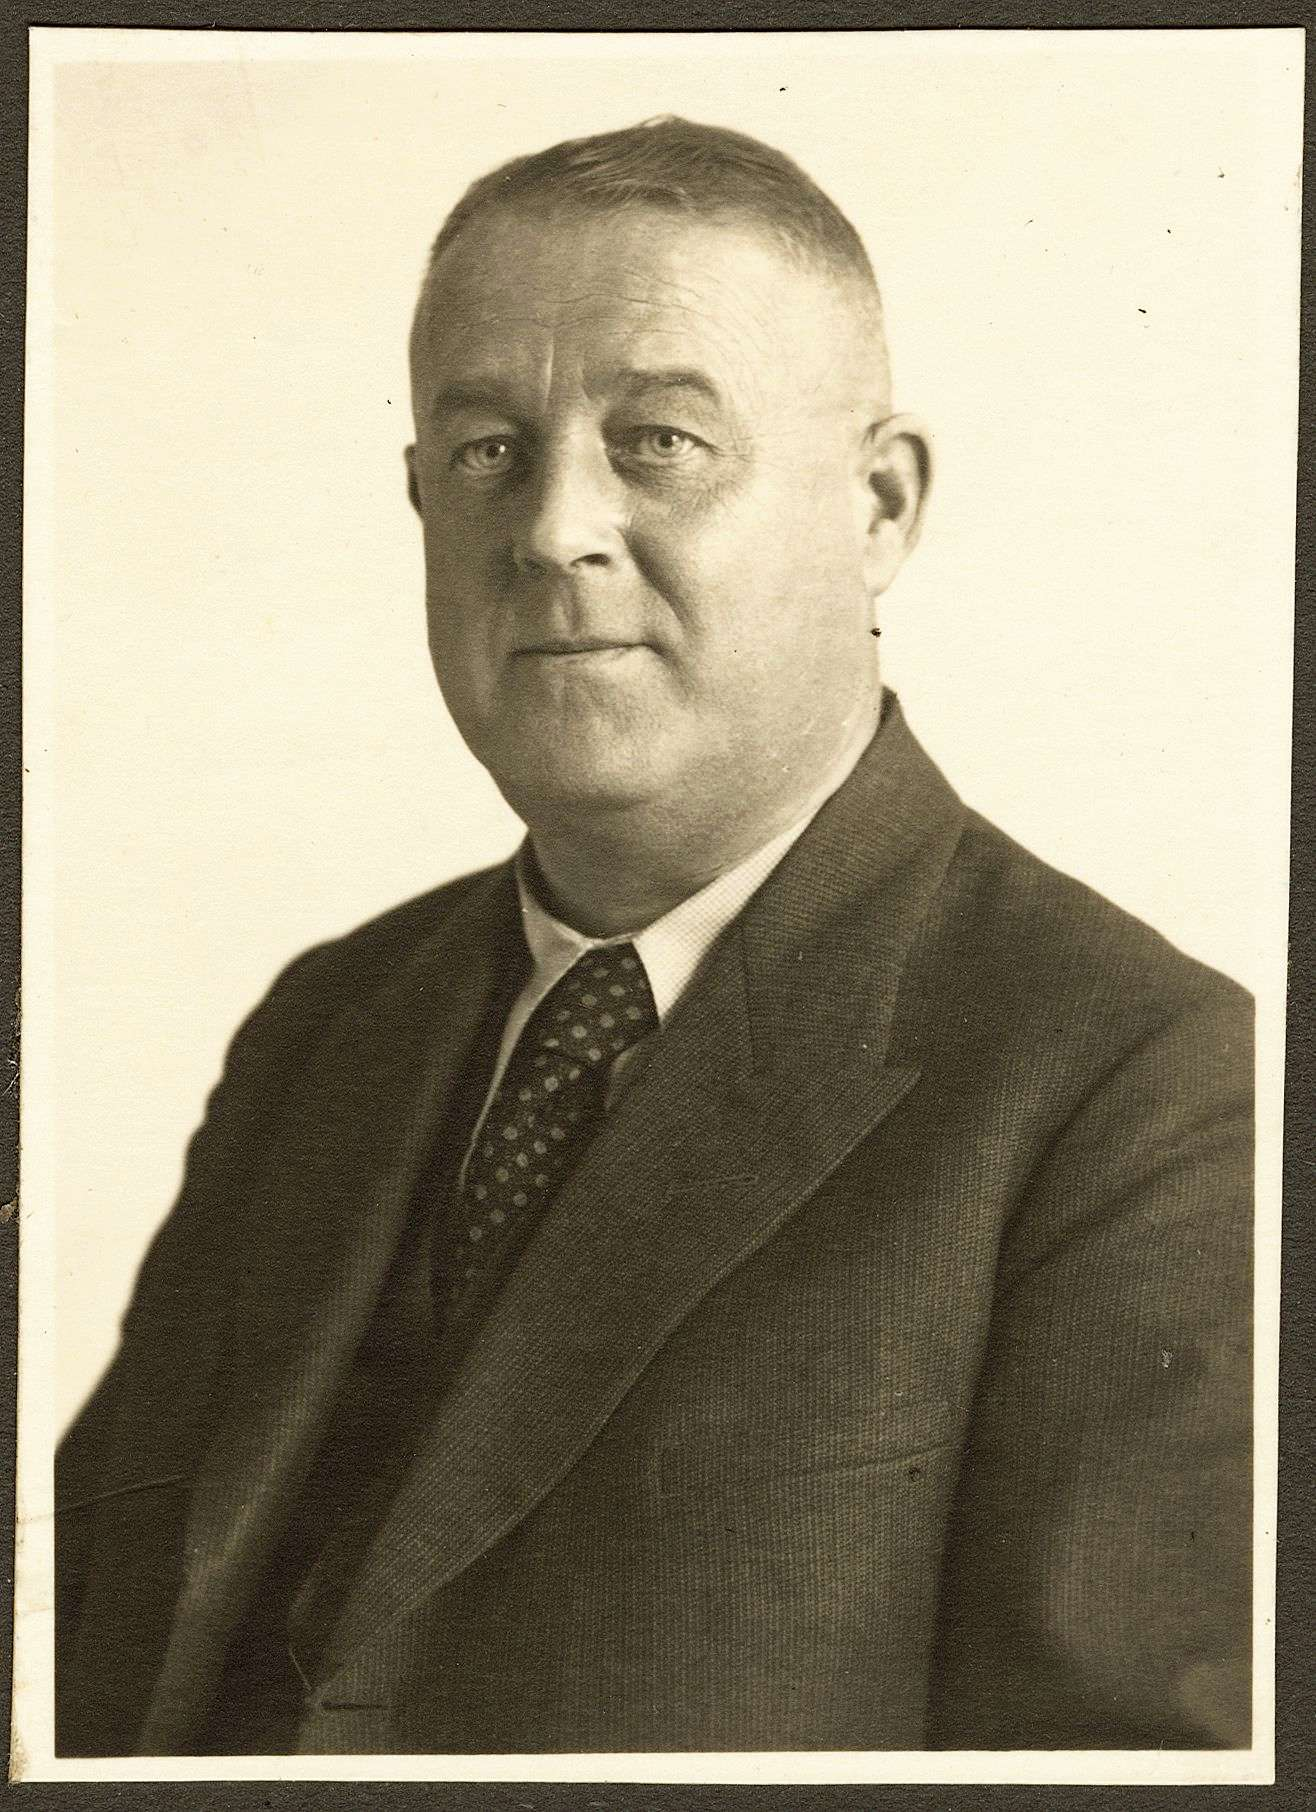 Döttinger, Heinrich, Bild 1